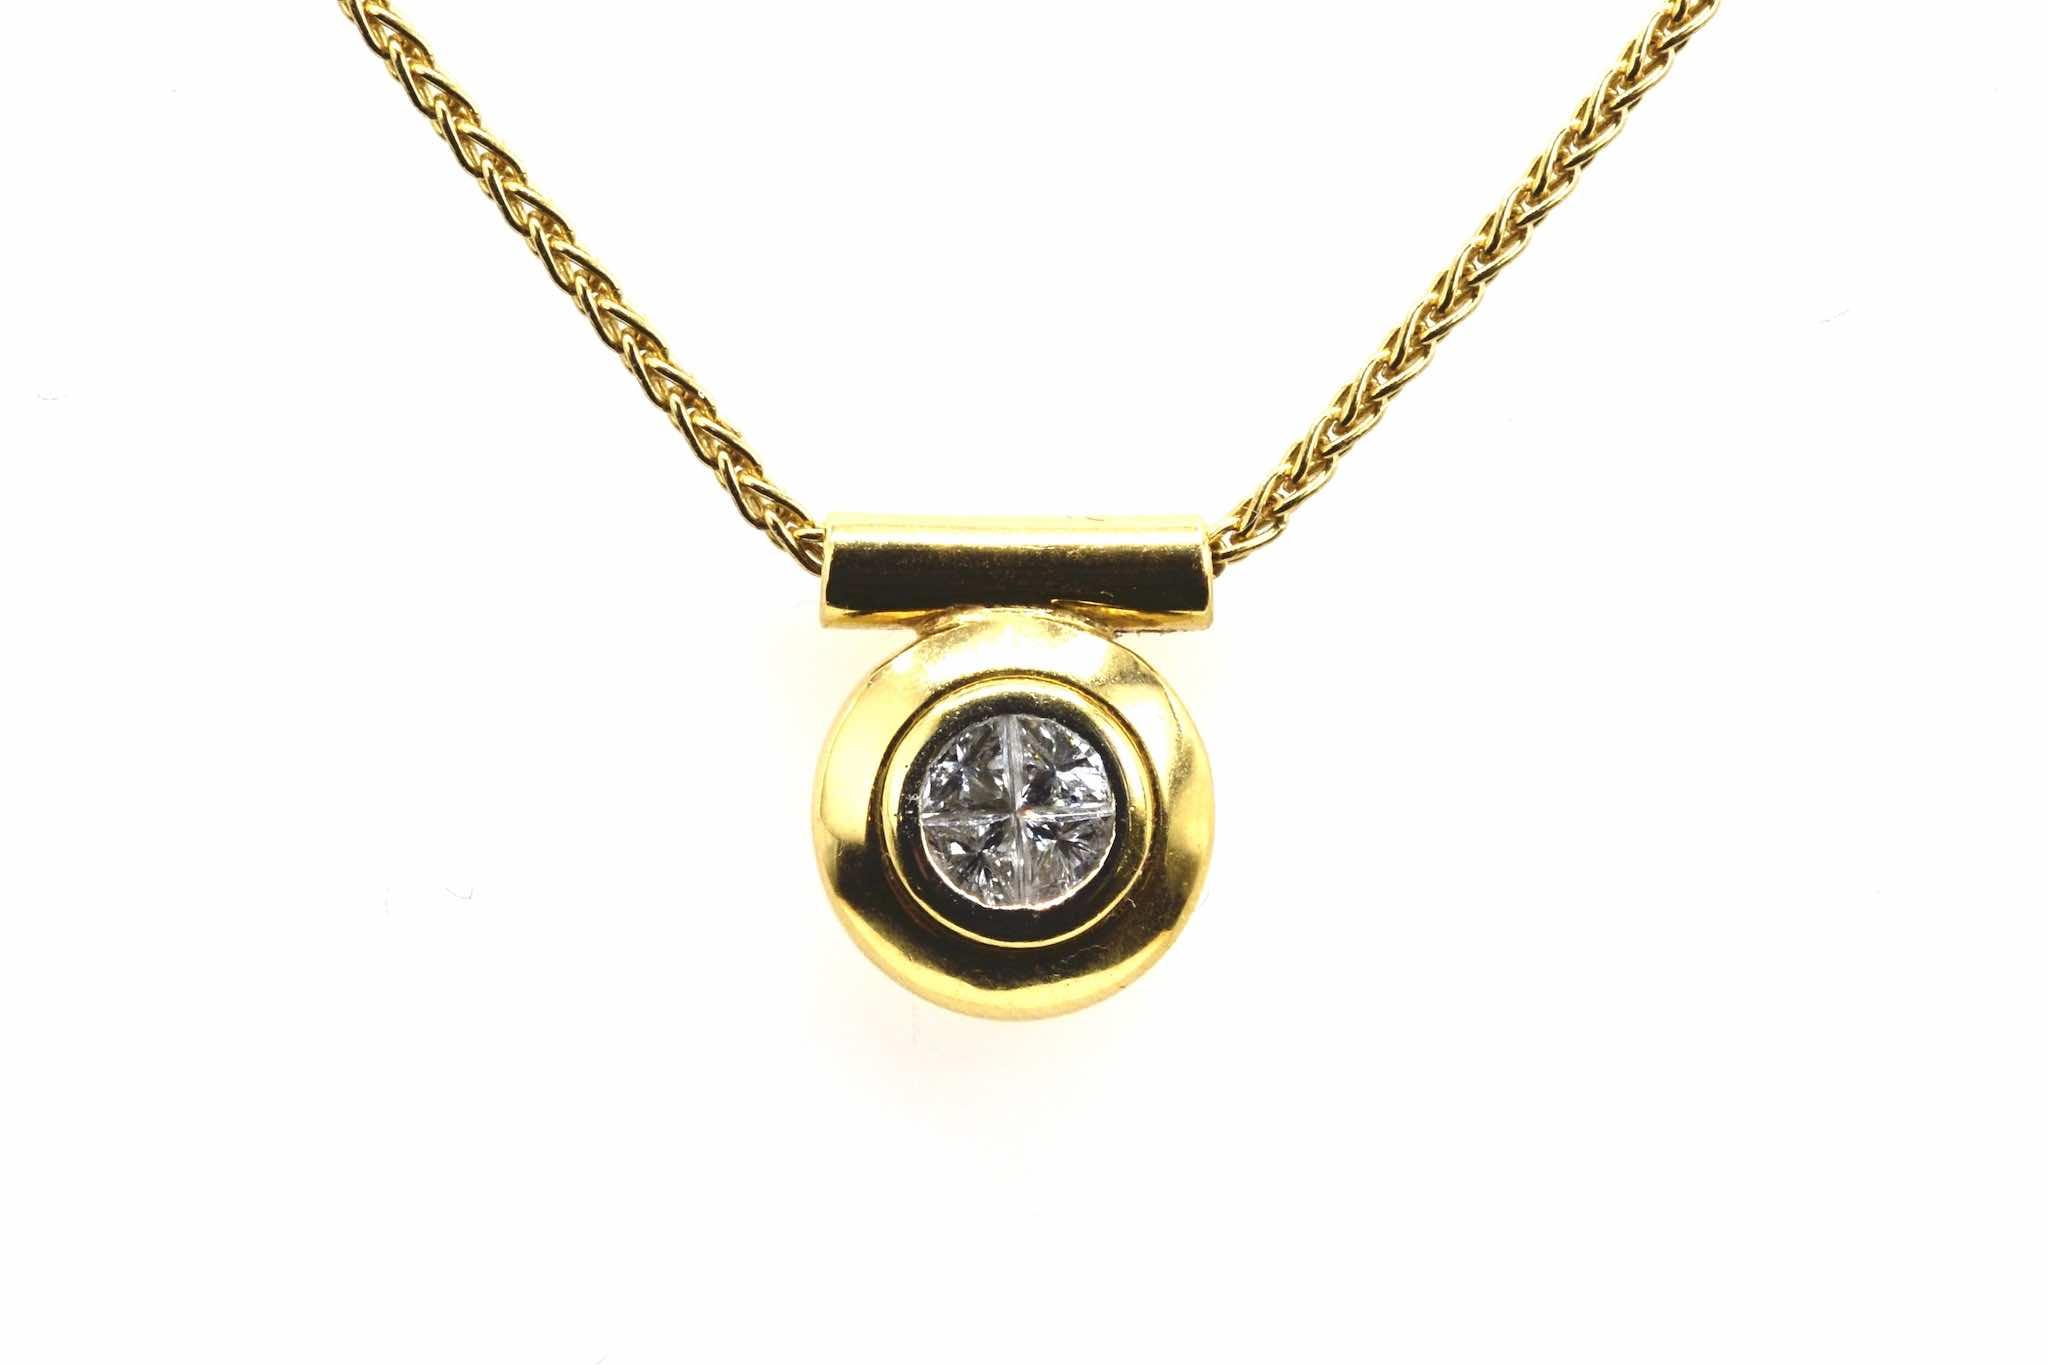 Pendentif diamants en or jaune 18k